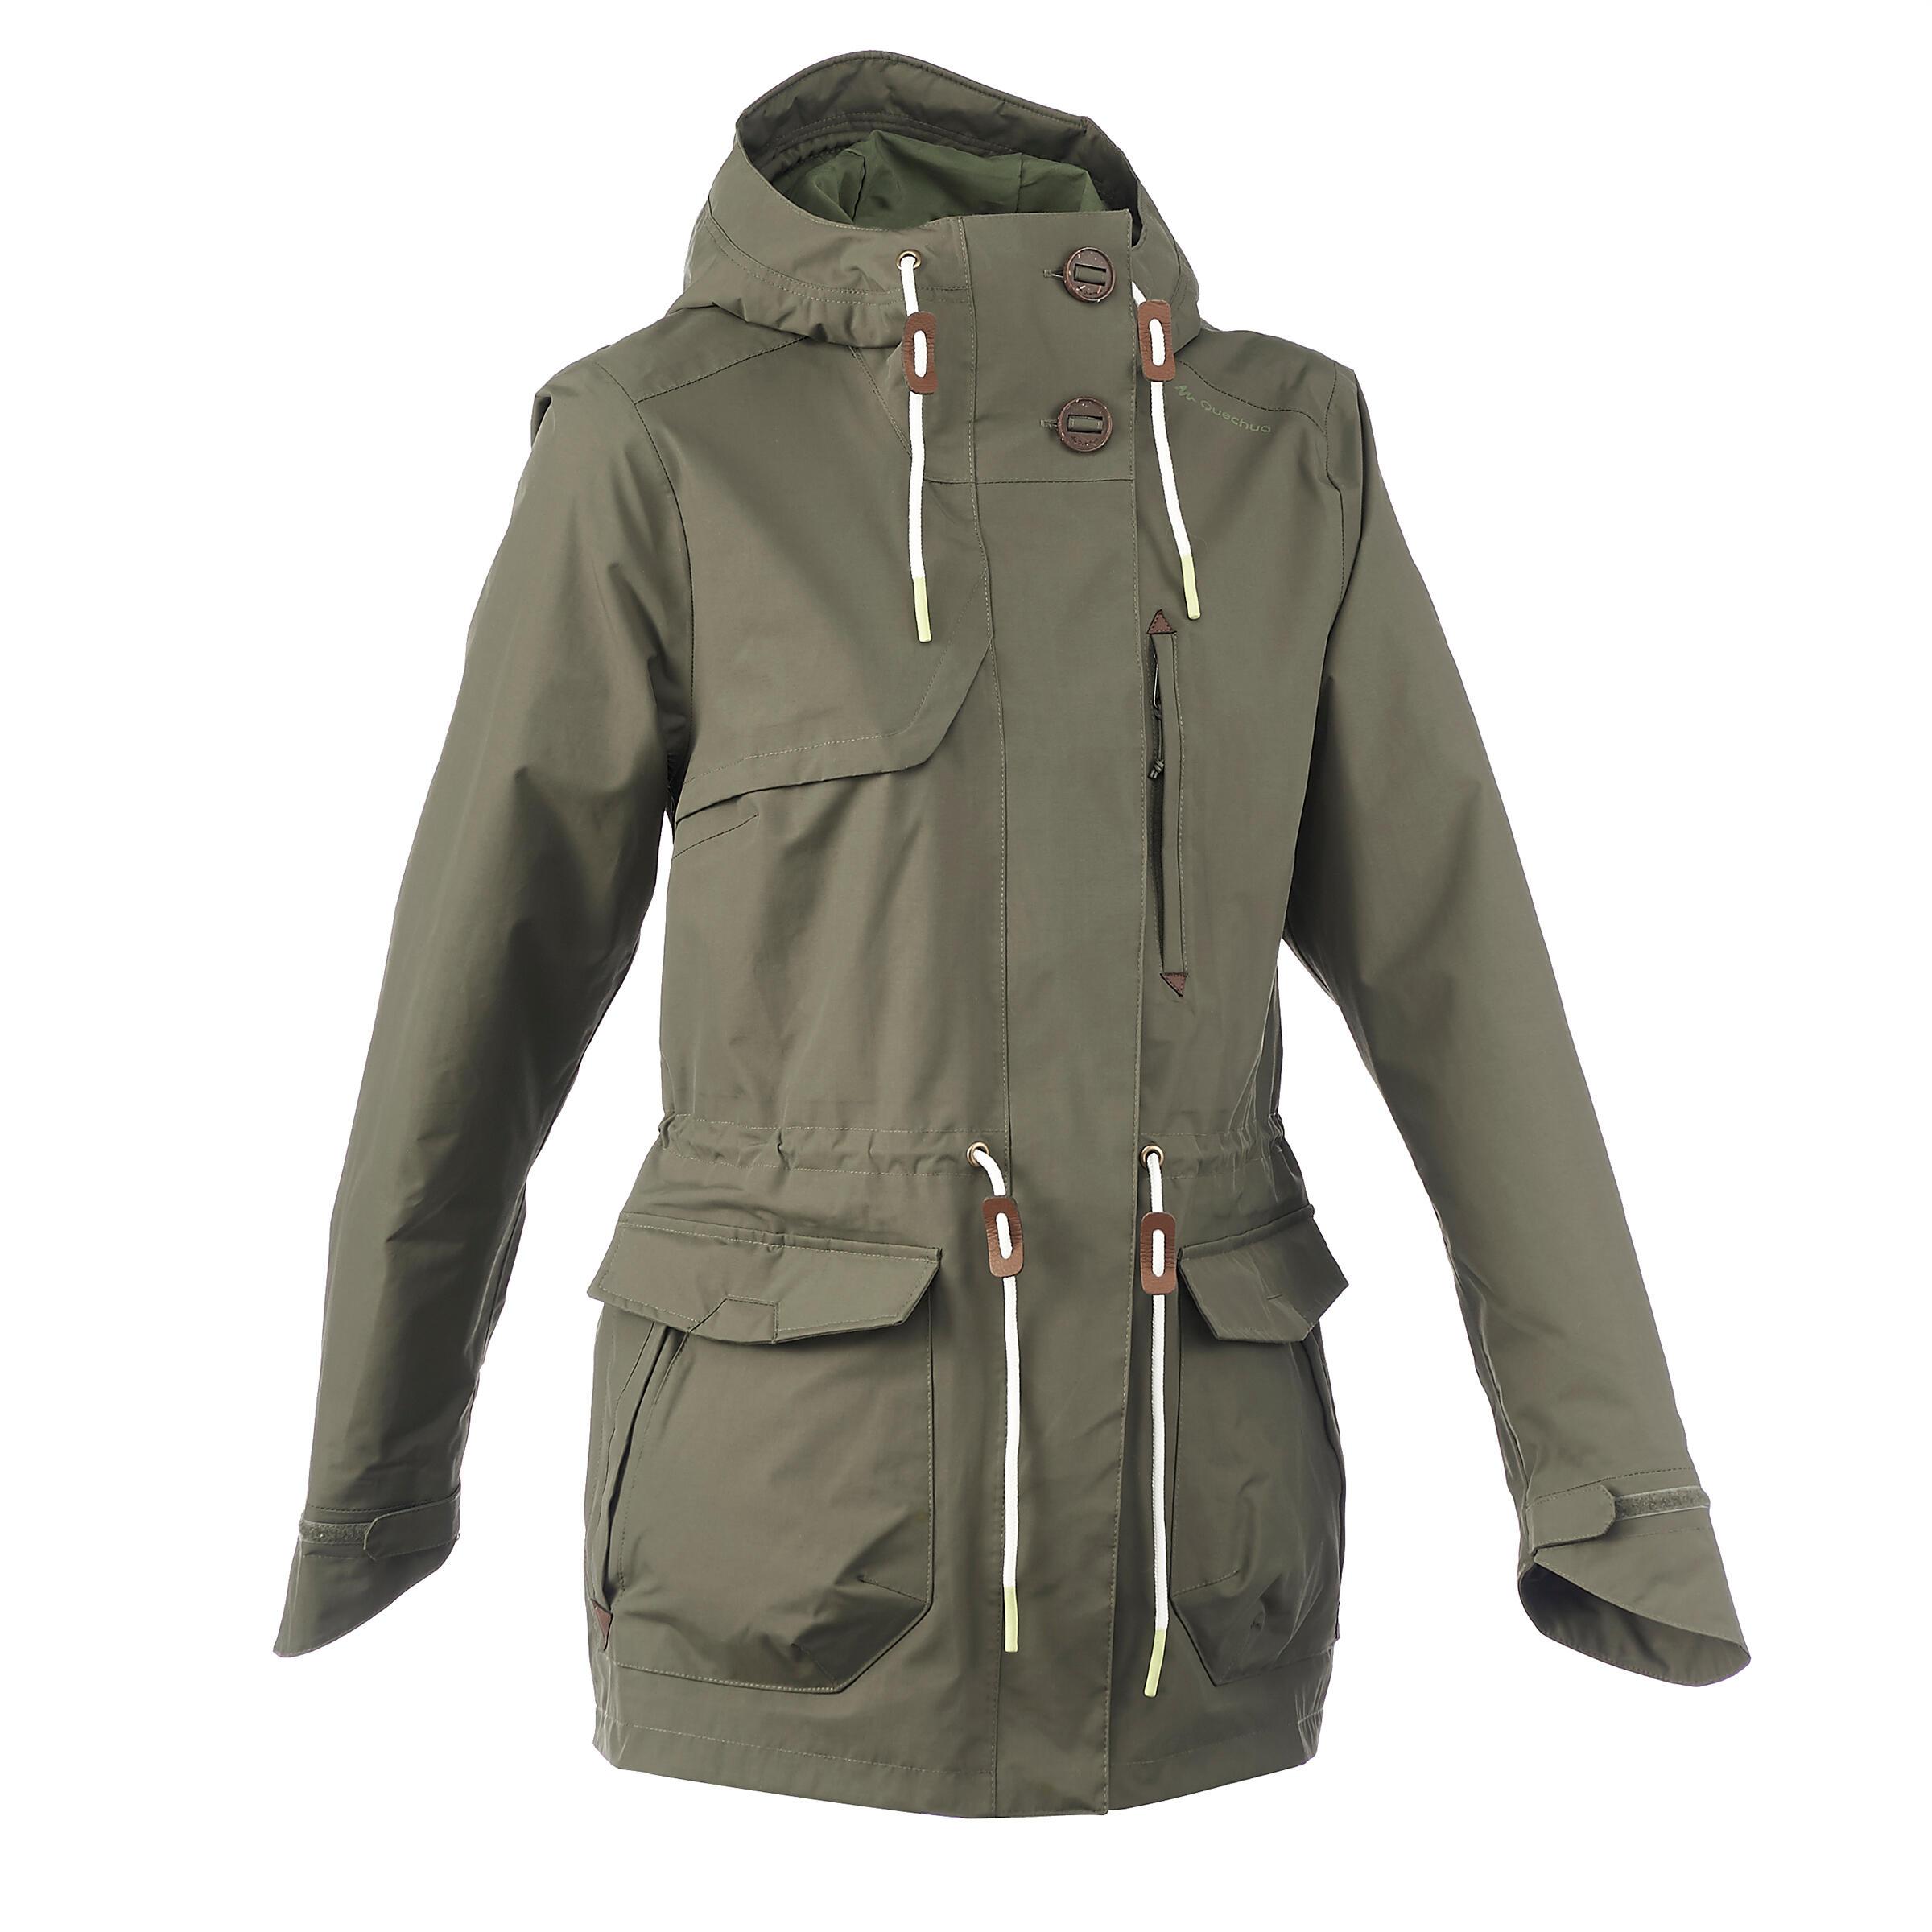 Jachetă impermeabilă NH550